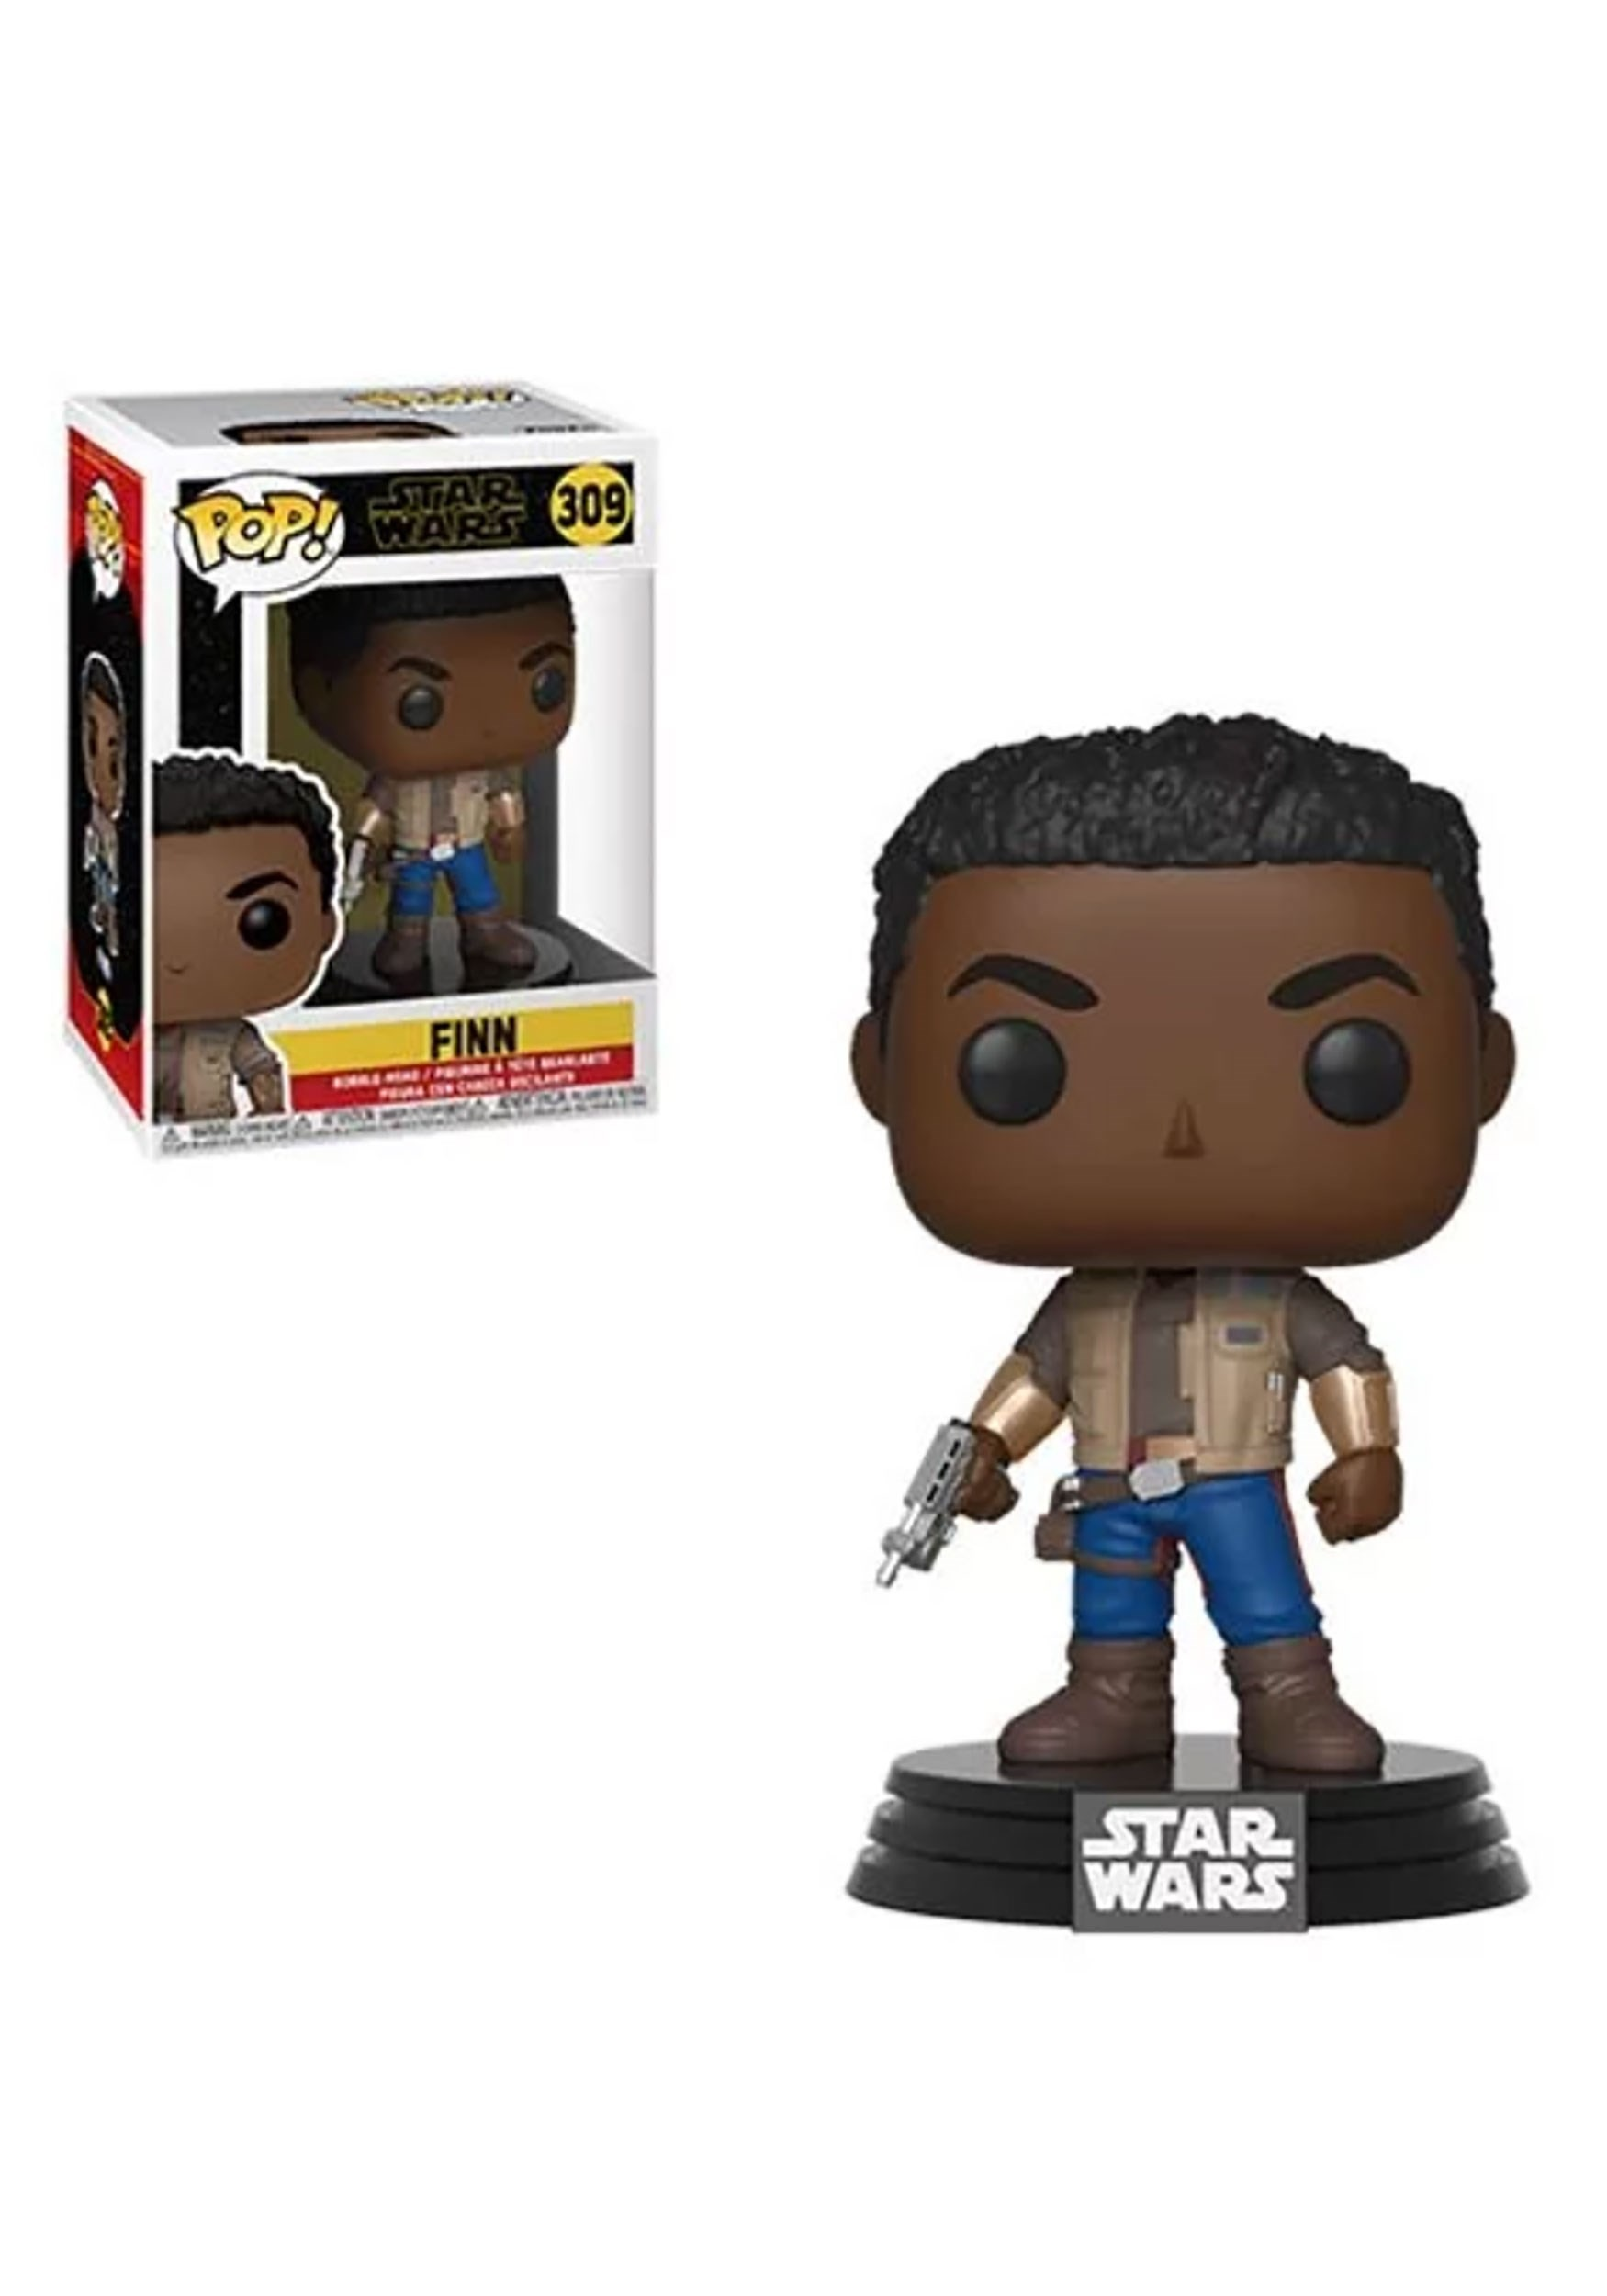 Finn Pop Star Wars The Rise Of Skywalker Bobblehead Figure